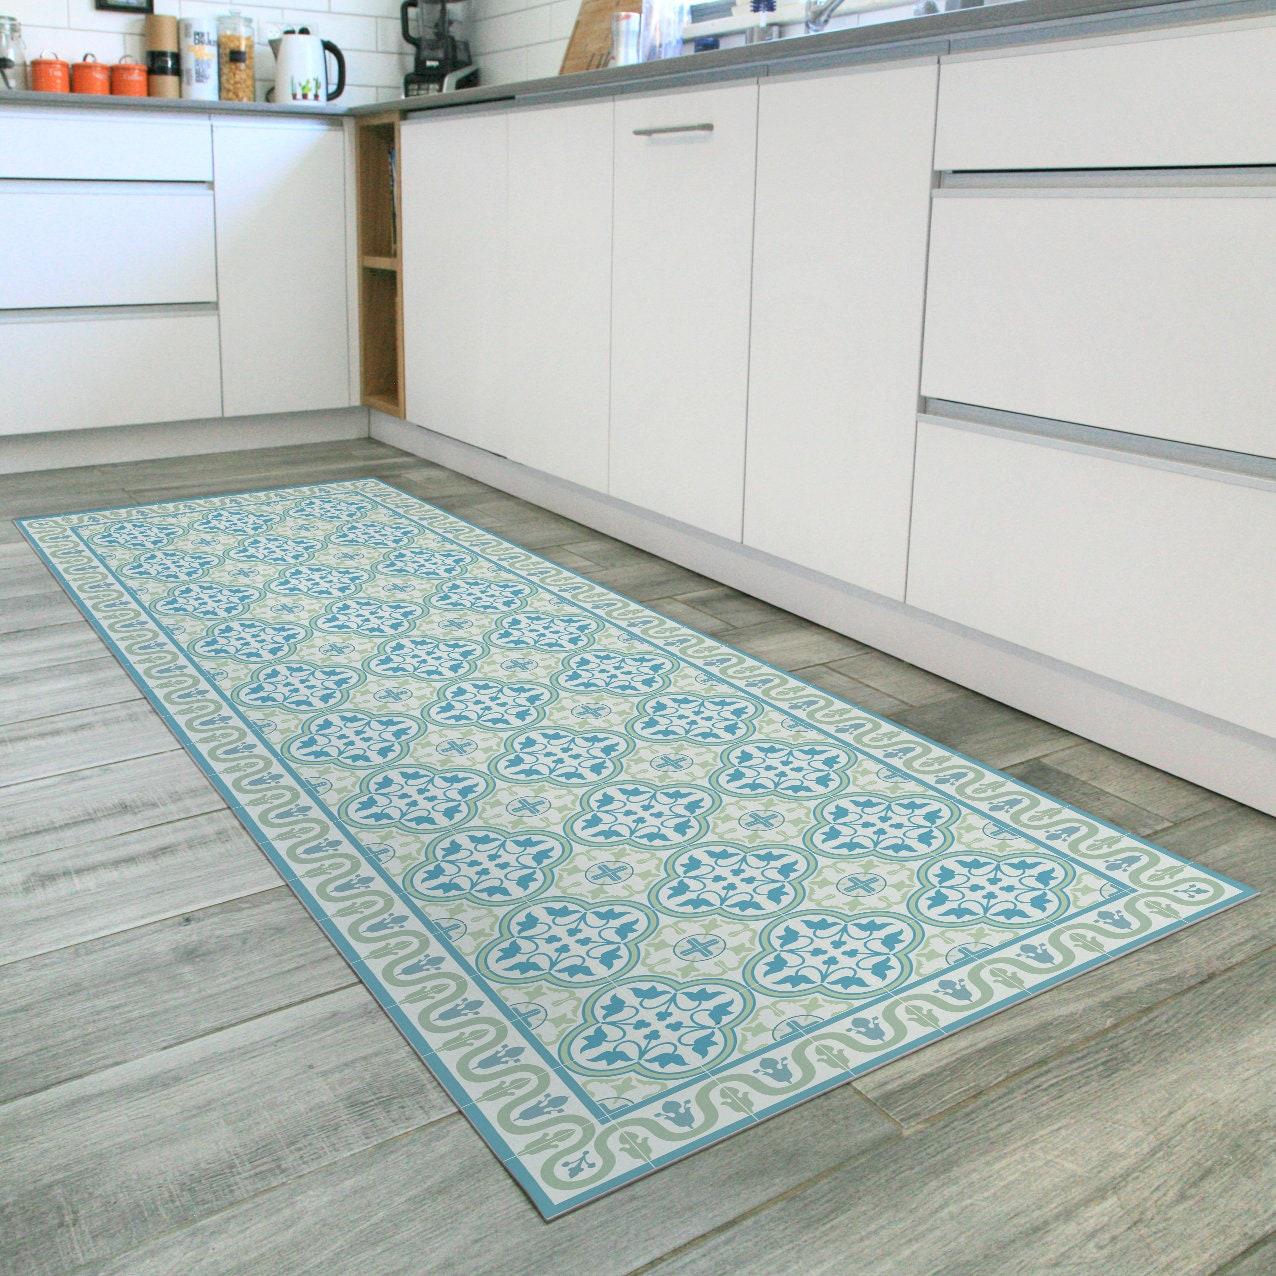 Turquoise and green runner rug with Spanish tiles design. Vintage runner  rug, printed on vinyl floor mat. Turquoise rug runner, kitchen rug.